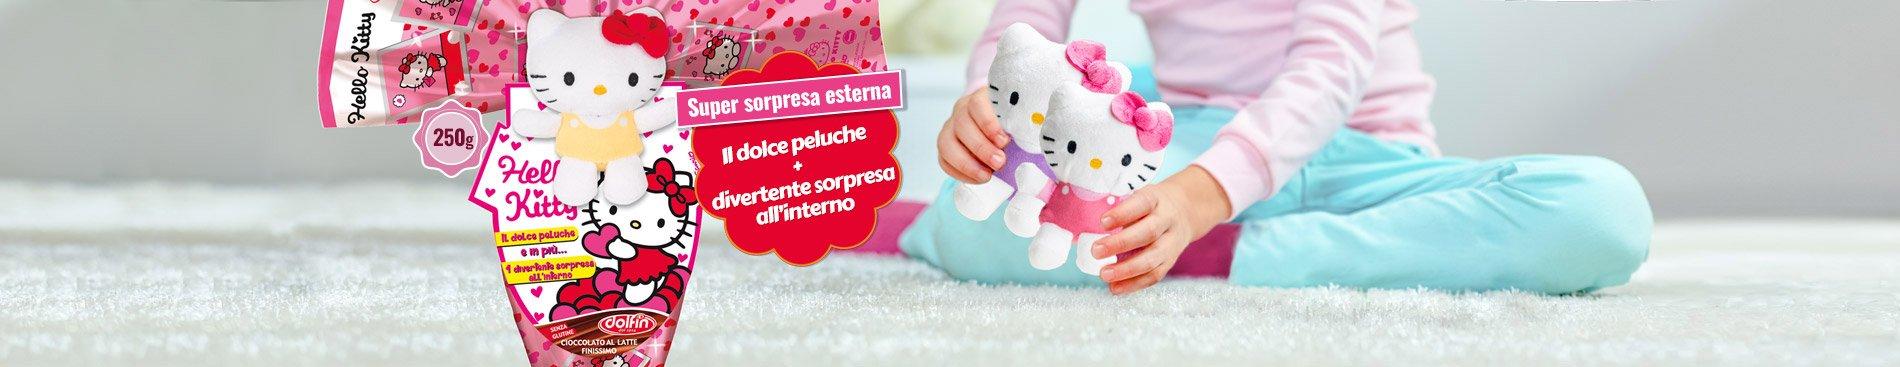 2020 pasqua - Hello Kitty